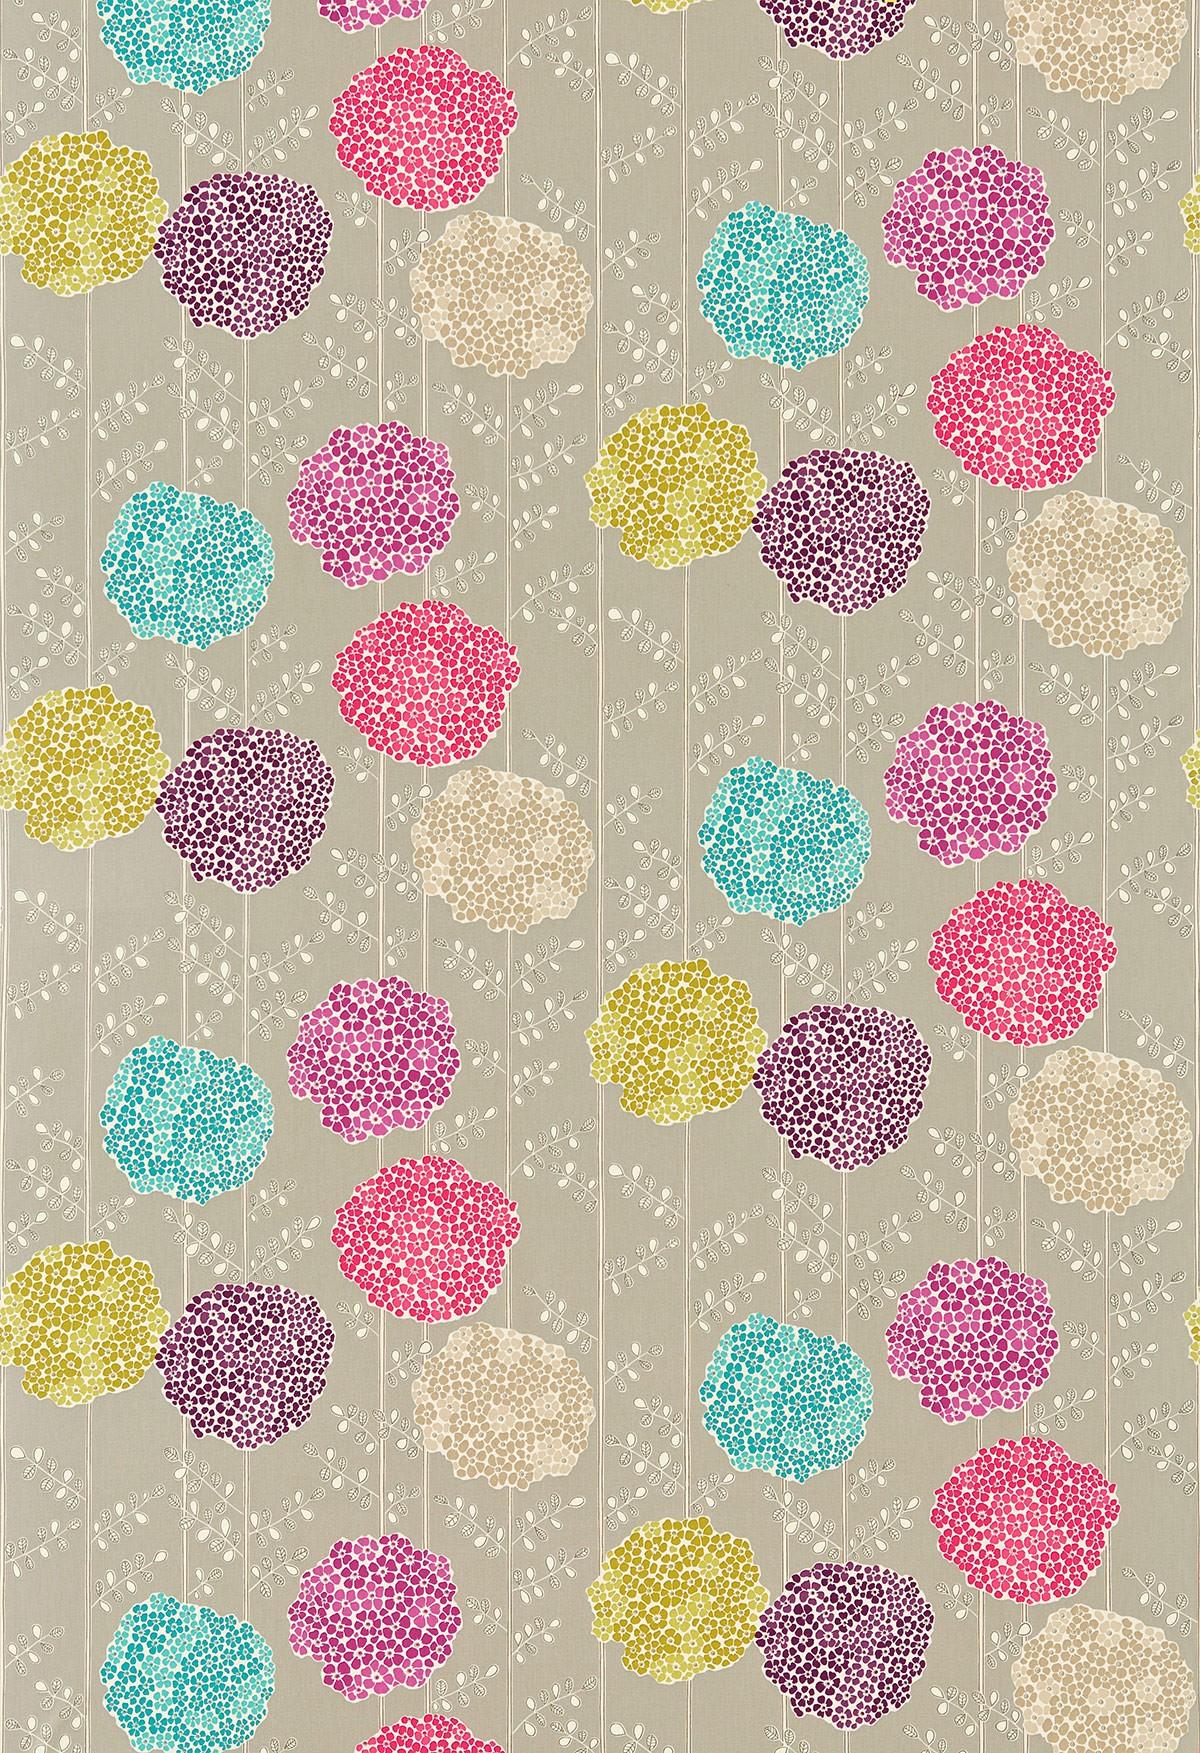 Harlequin Pattern Wallpaper Orsina by harlequin 1200x1753